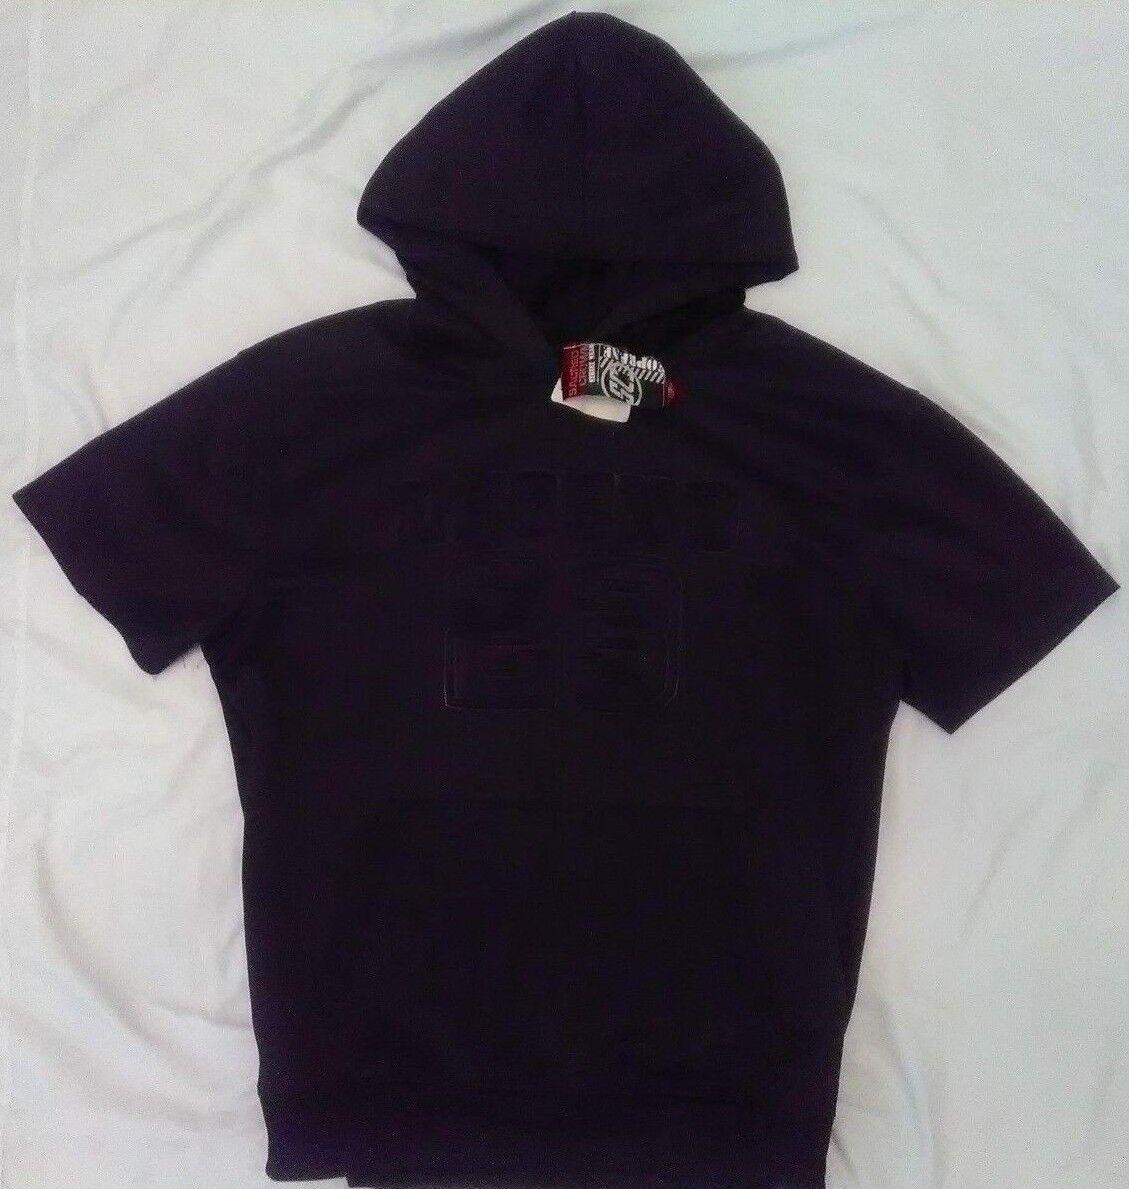 Legend 23 Jordan  Herren XL Hoodie Sweatshirts Sportswear                       I